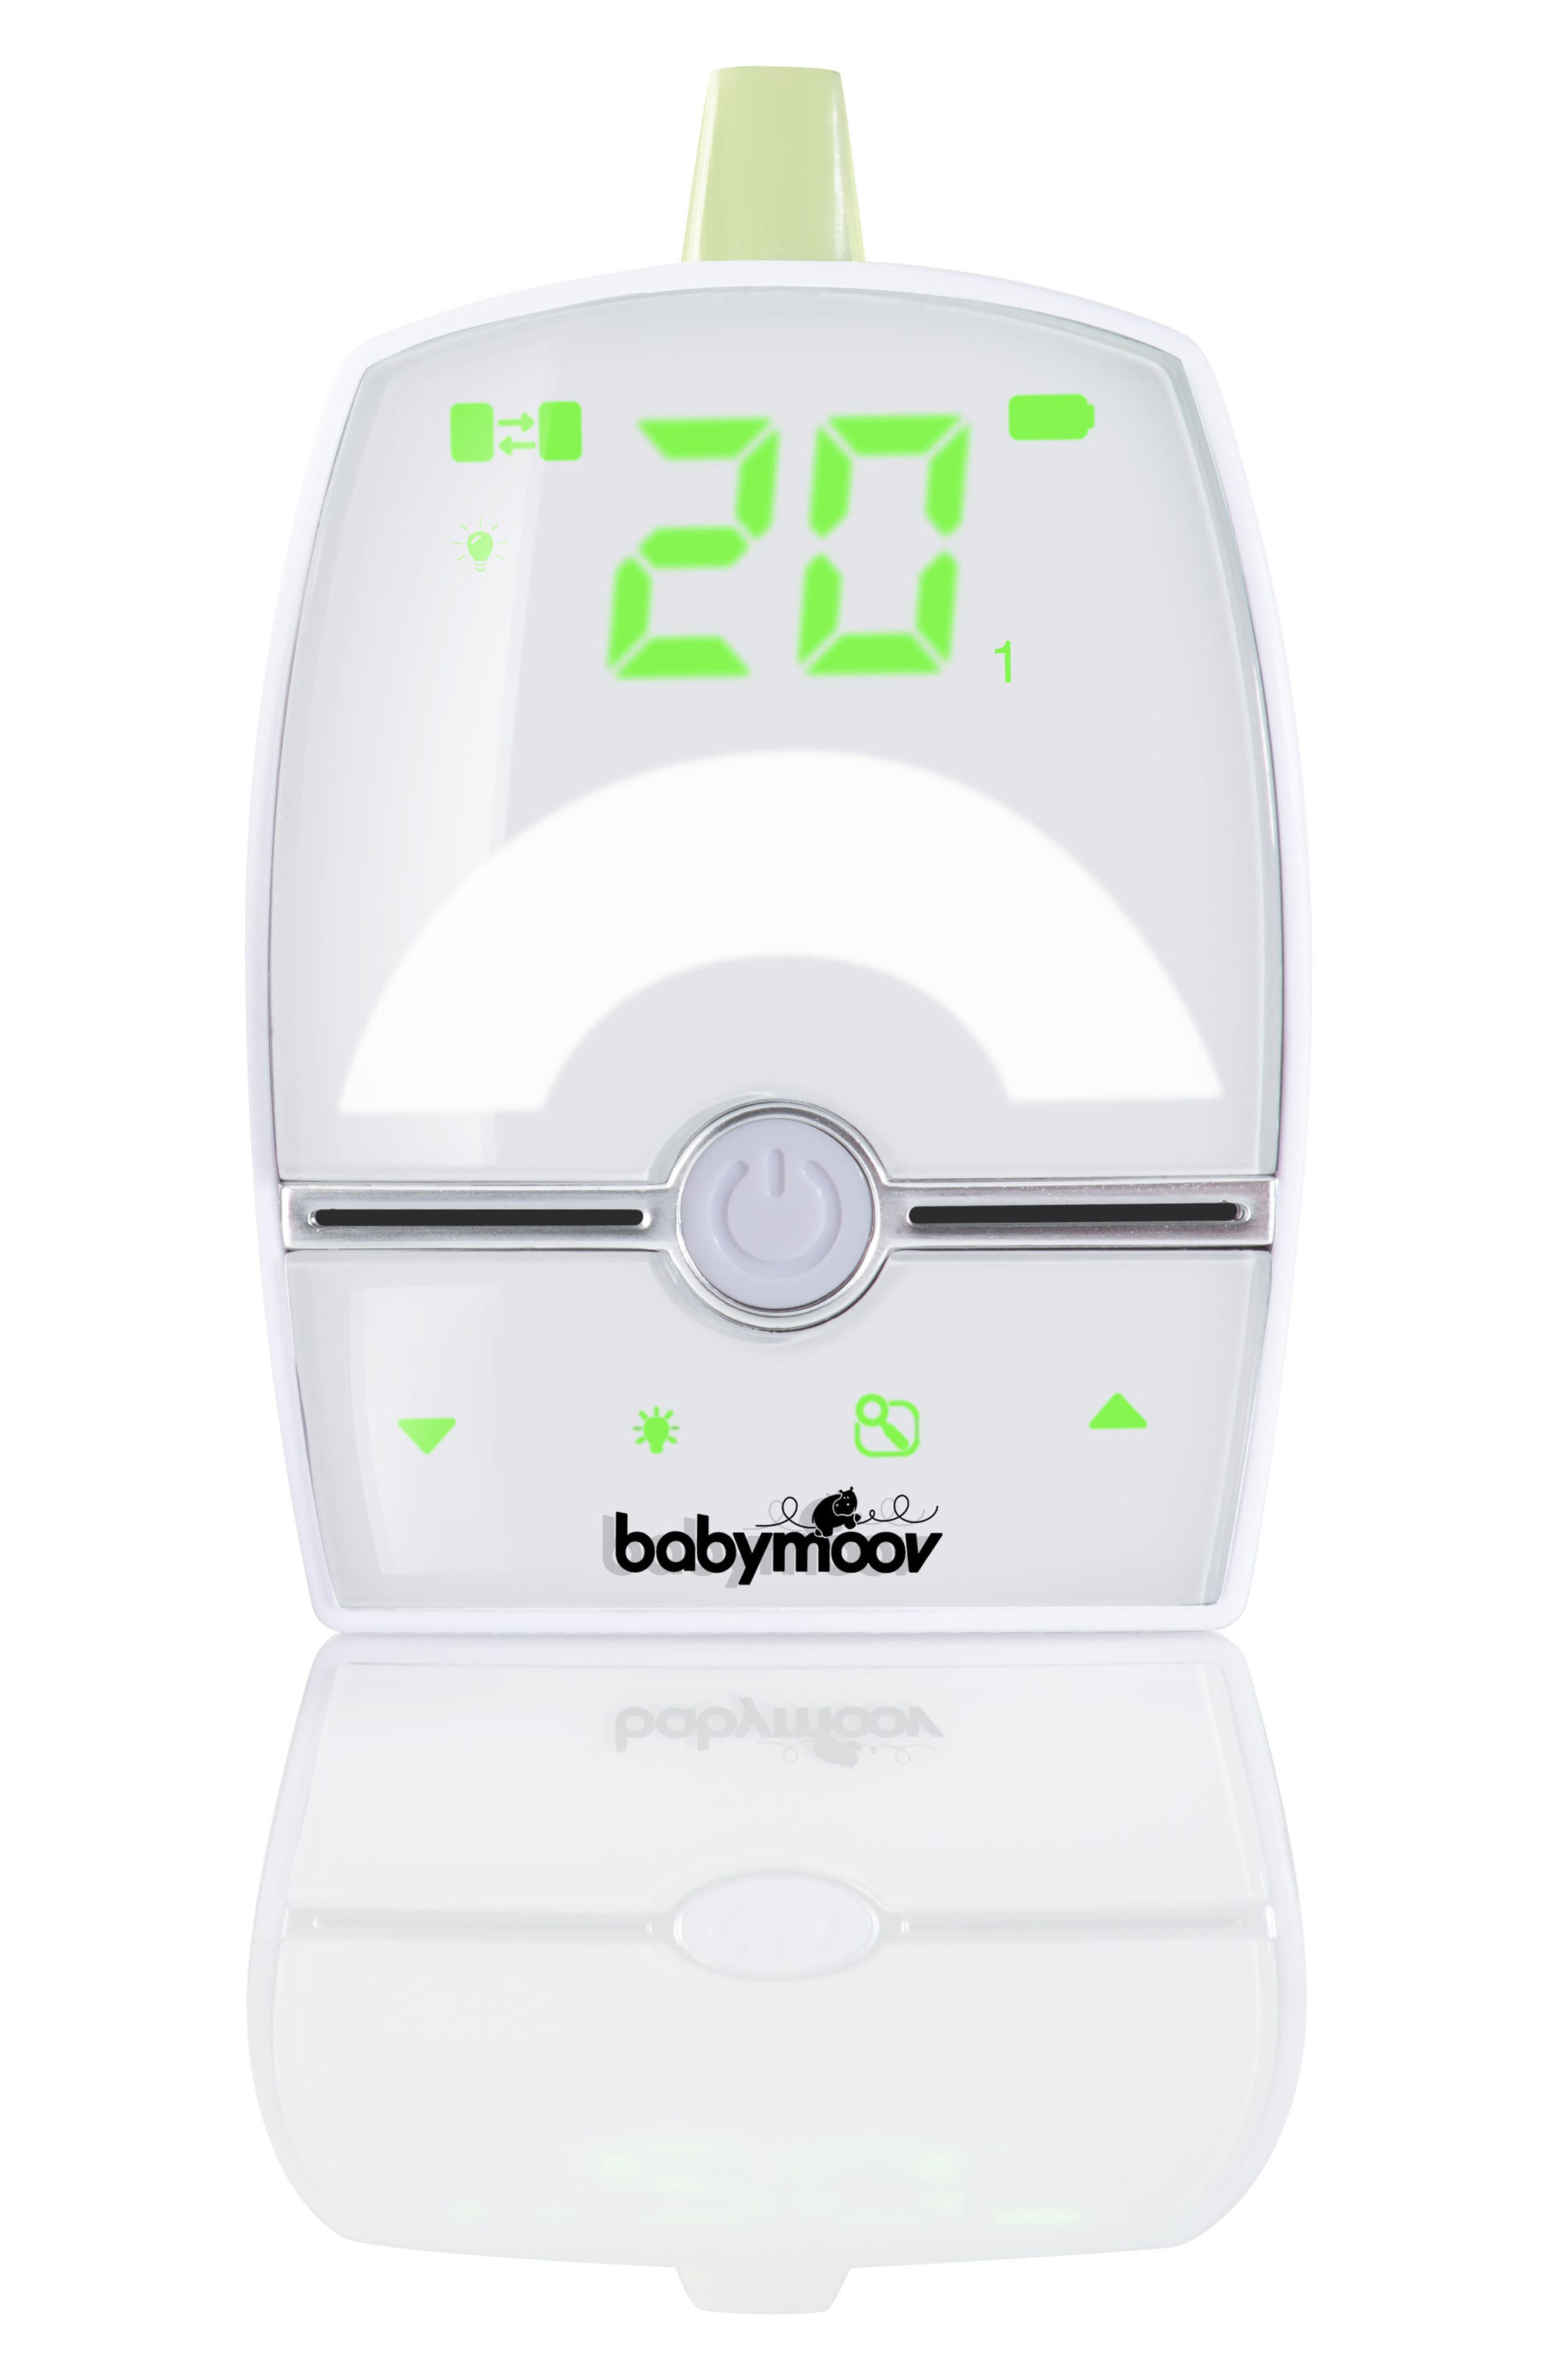 Extra Transmitter for Babymoov Premium Care Baby Moniter,                         Main,                         color, White